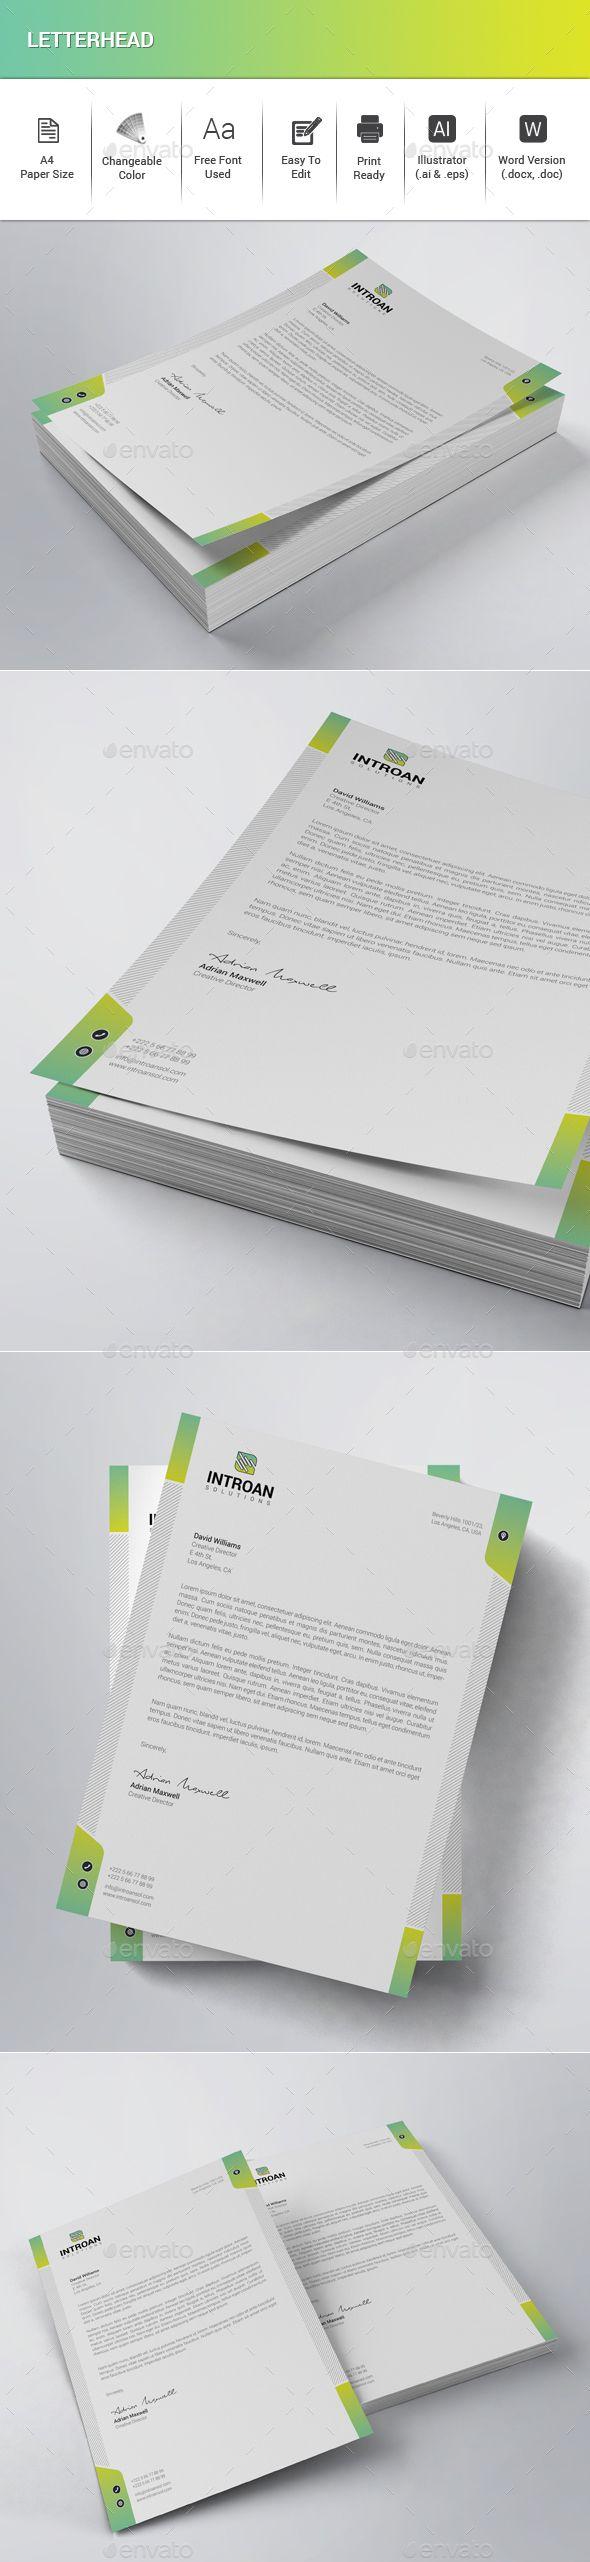 letterhead template vector eps ai illustrator ms word